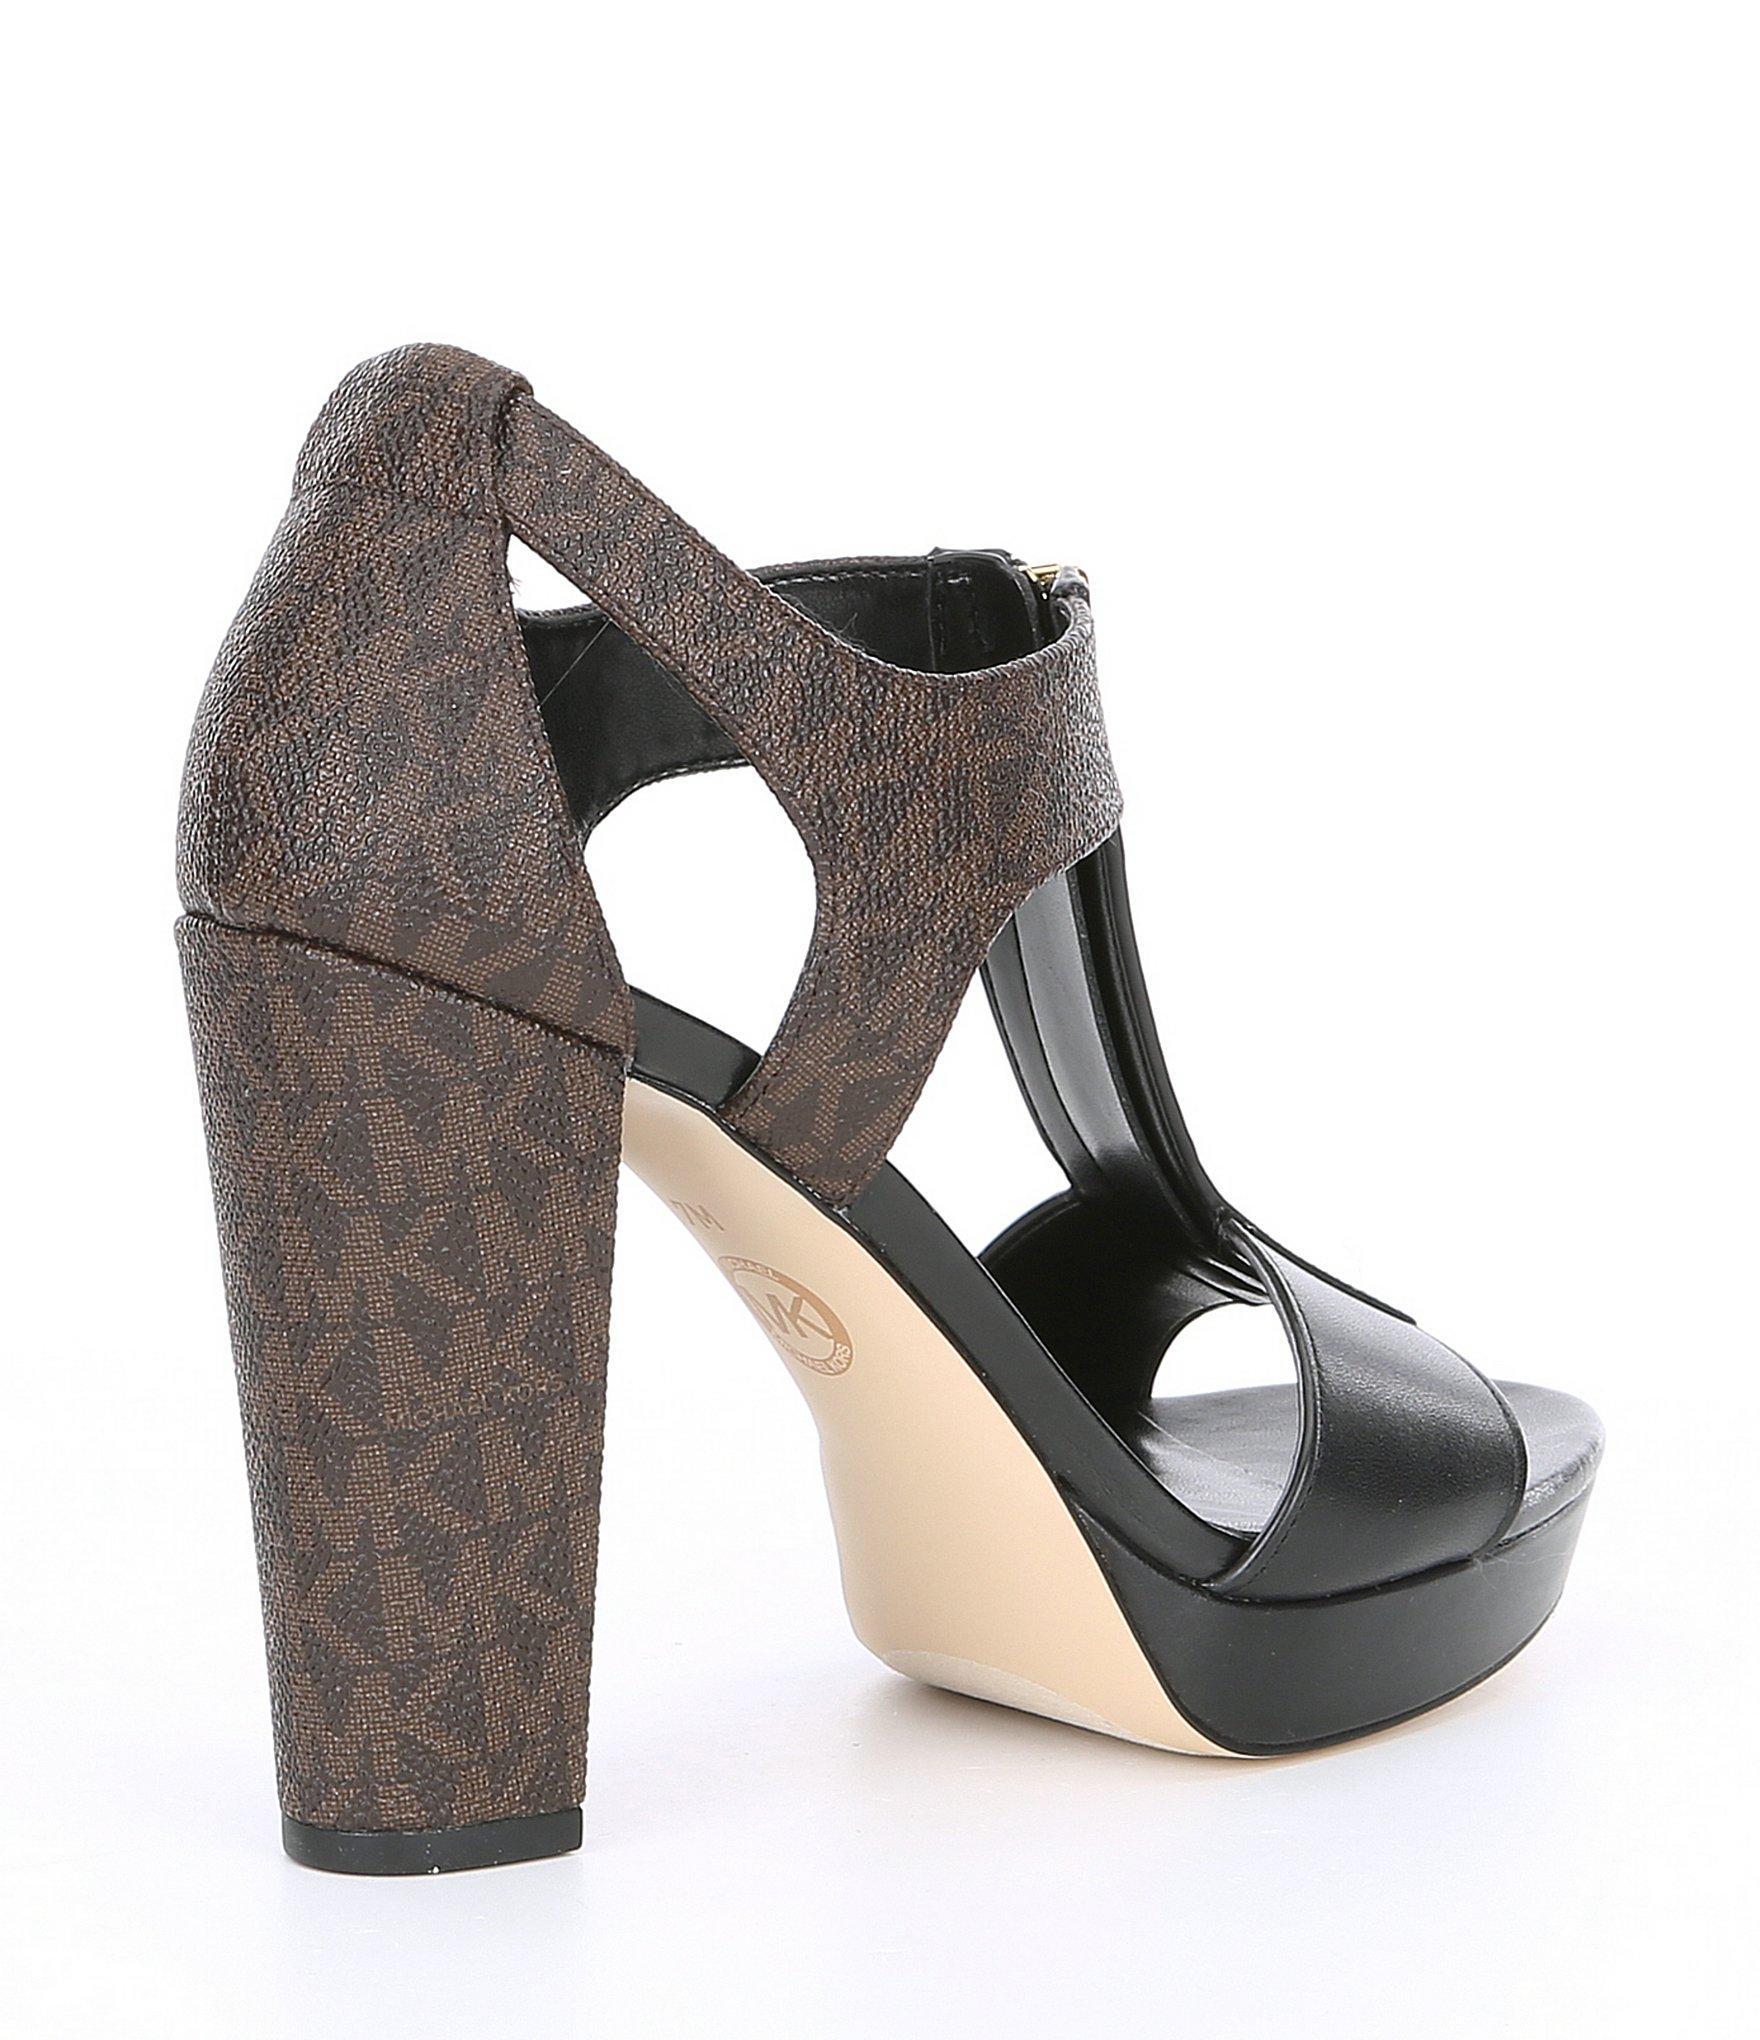 7a9d76b7578e MICHAEL Michael Kors - Black Mk Logo Berkley Leather Block Heel Sandals -  Lyst. View fullscreen